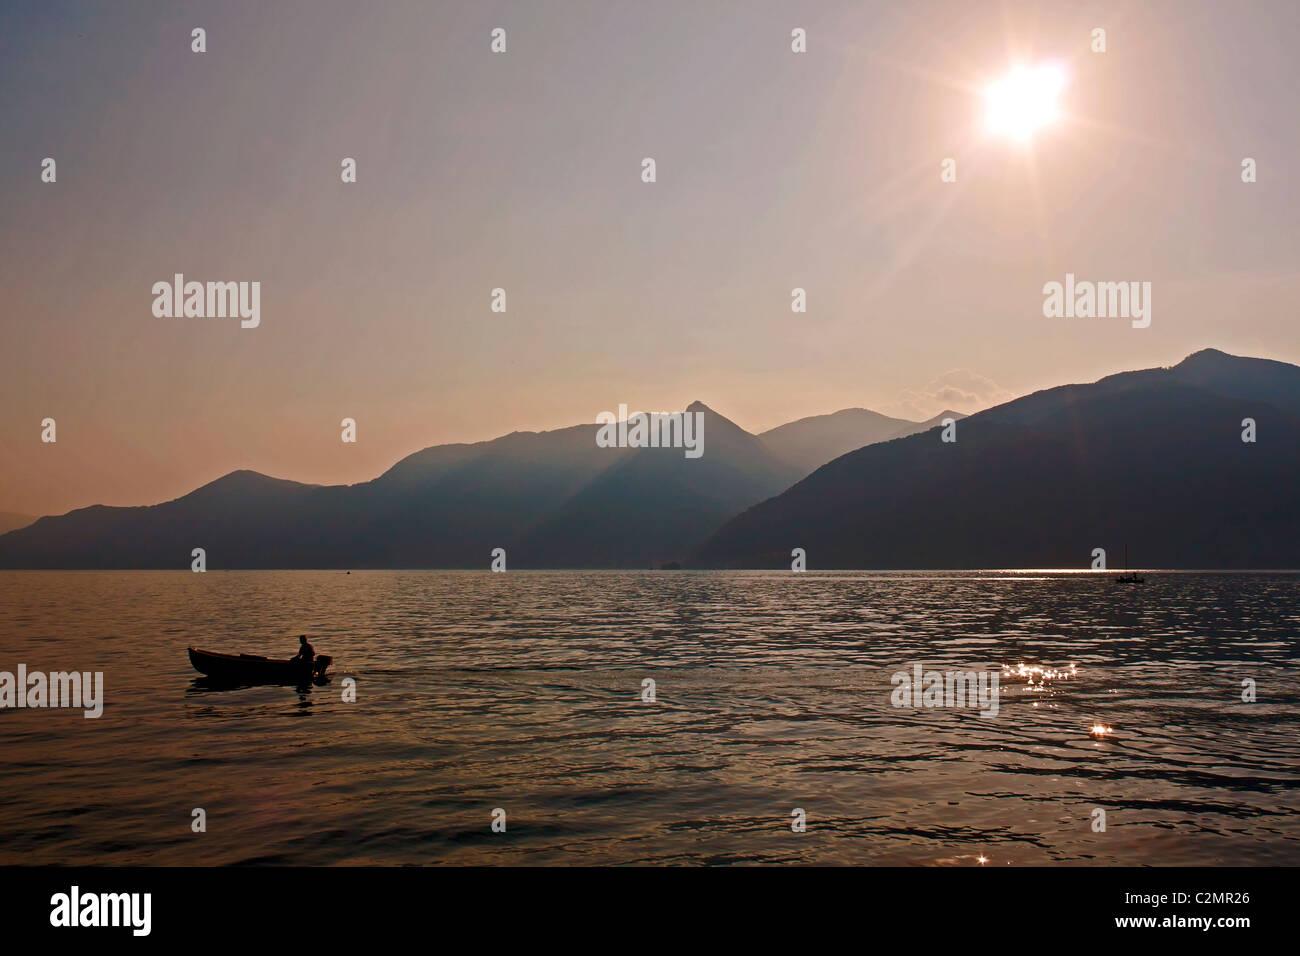 Sunset at Lago Maggiore - Stock Image